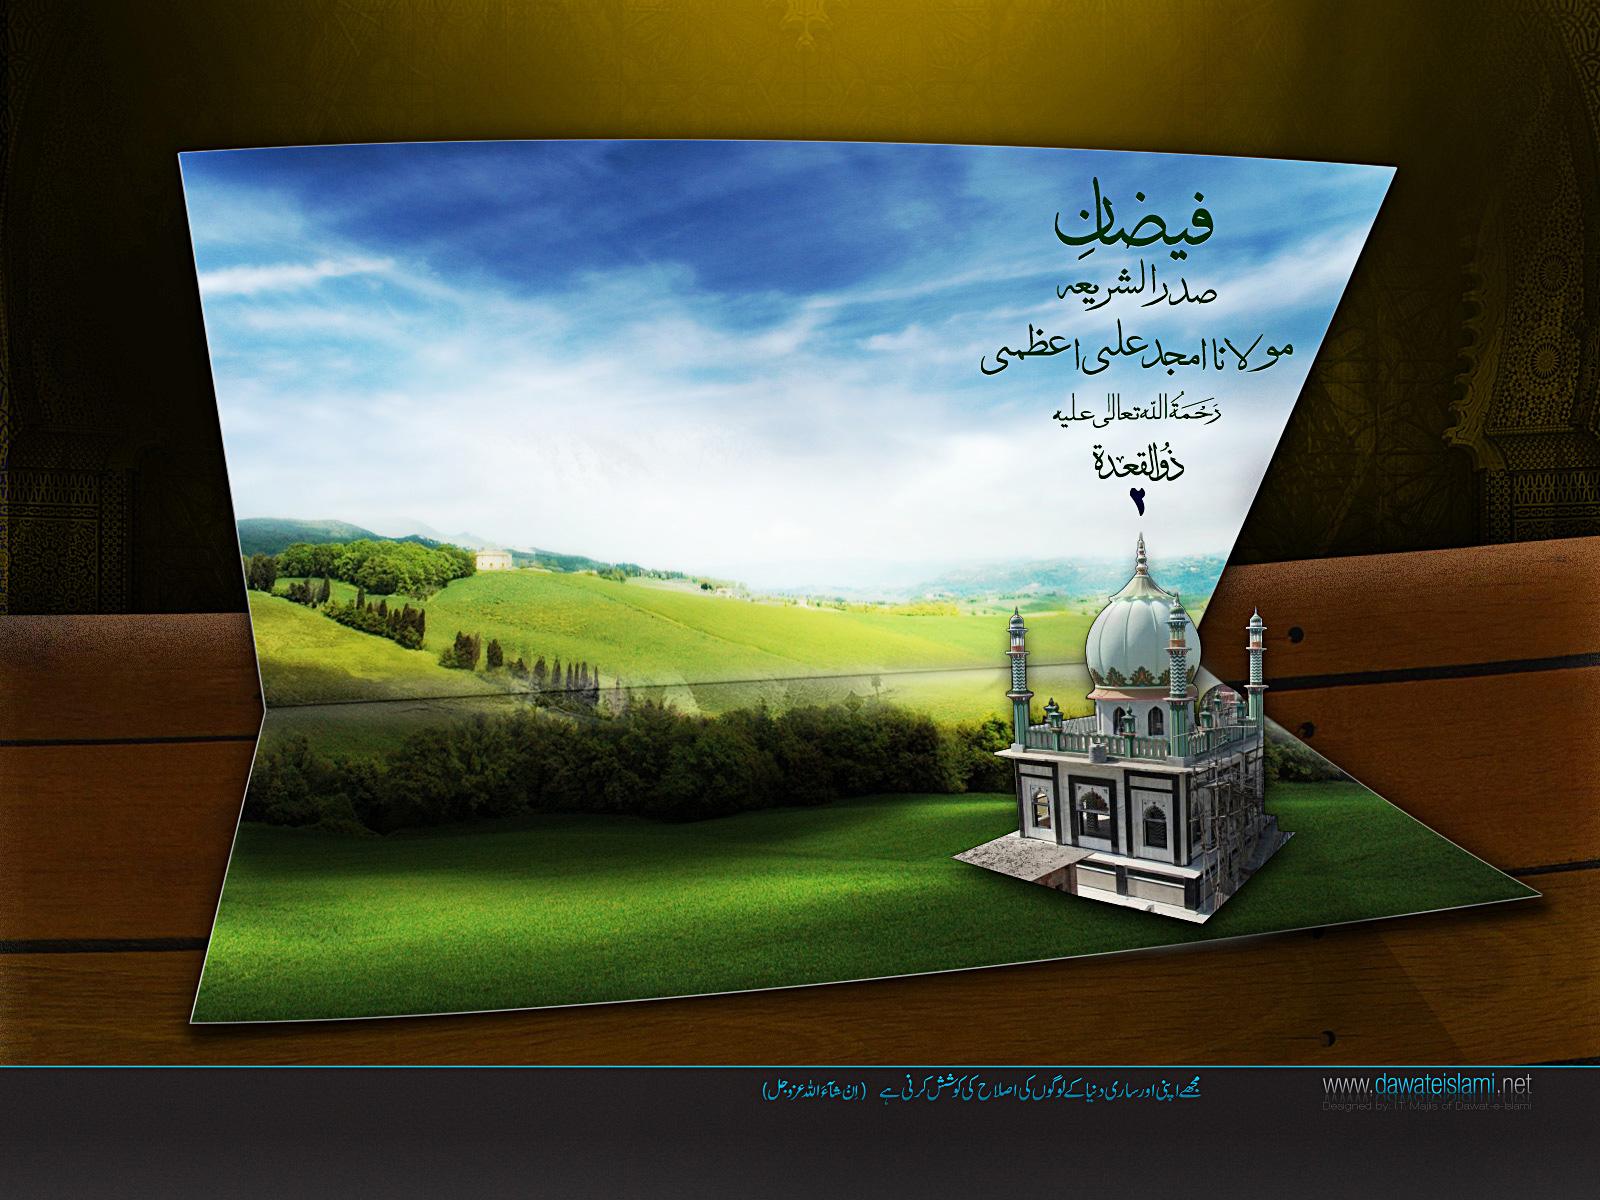 http://1.bp.blogspot.com/-7DDbsmypYNM/UG3D9ZkIUEI/AAAAAAAAAcE/FhSBl9qX9FE/s1600/islamic-wallpapers-ziqad-sahib-e-bahar-e-shariat-sunni-muslim-scholar-1.jpg